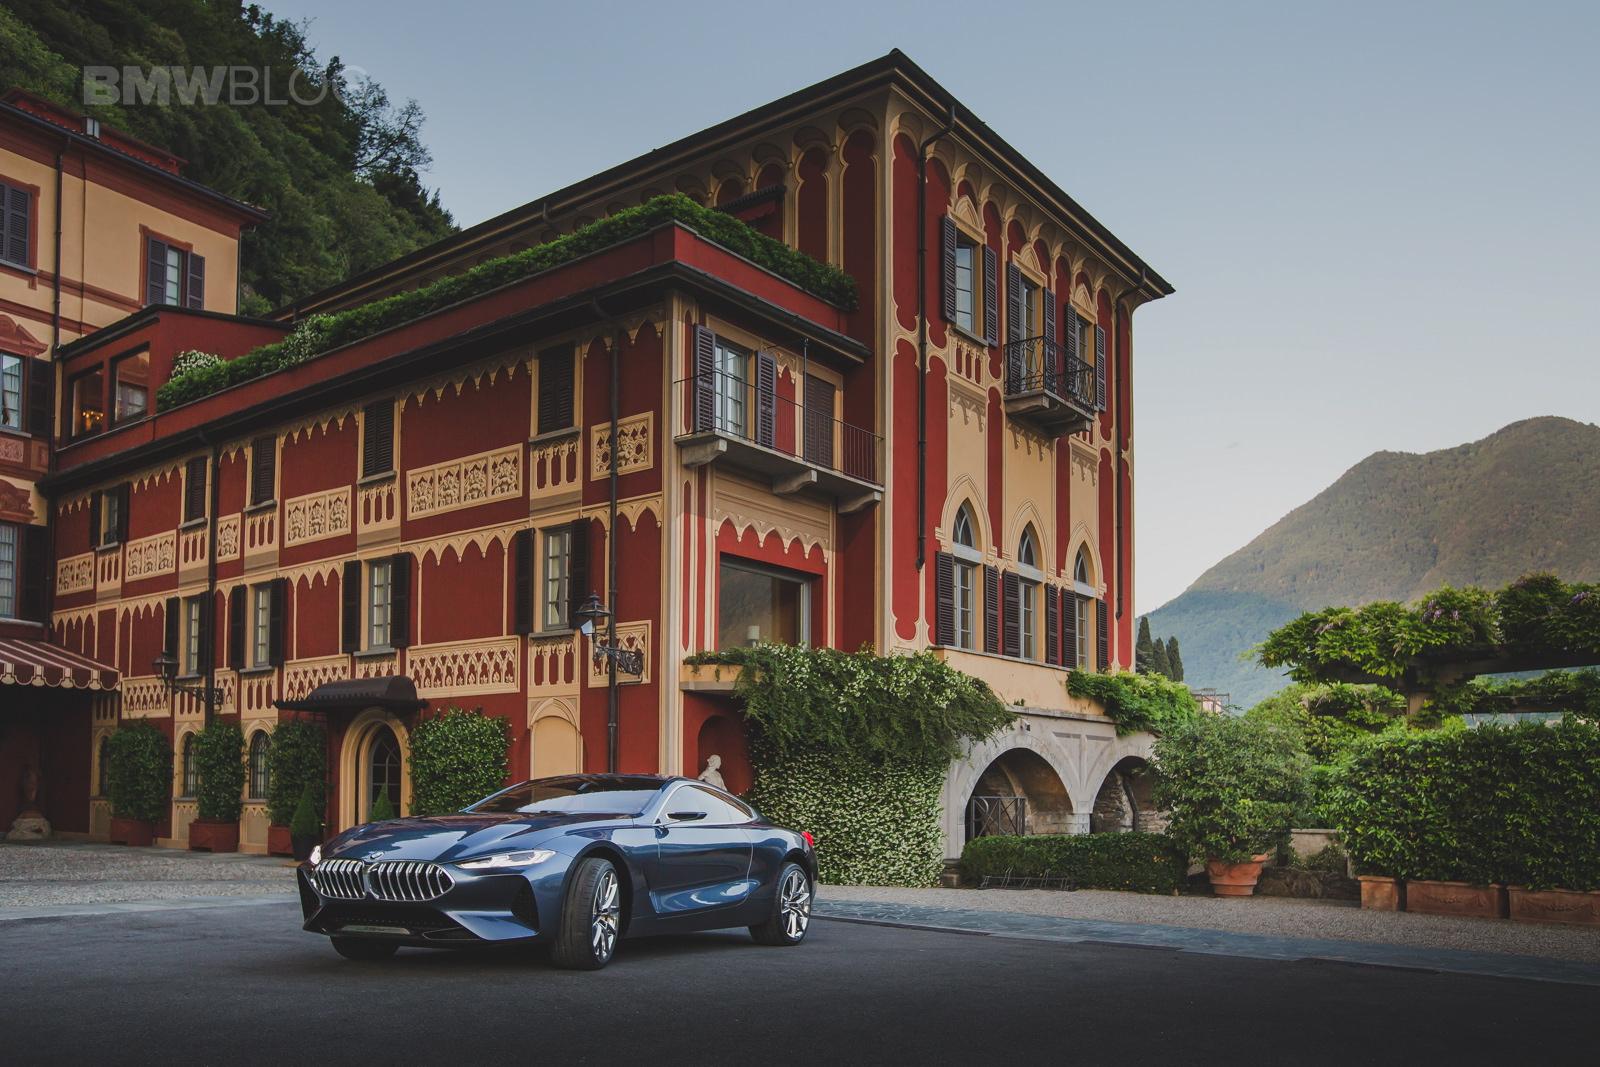 BMW-Concept-8-Series-Villa-deste-2017-02